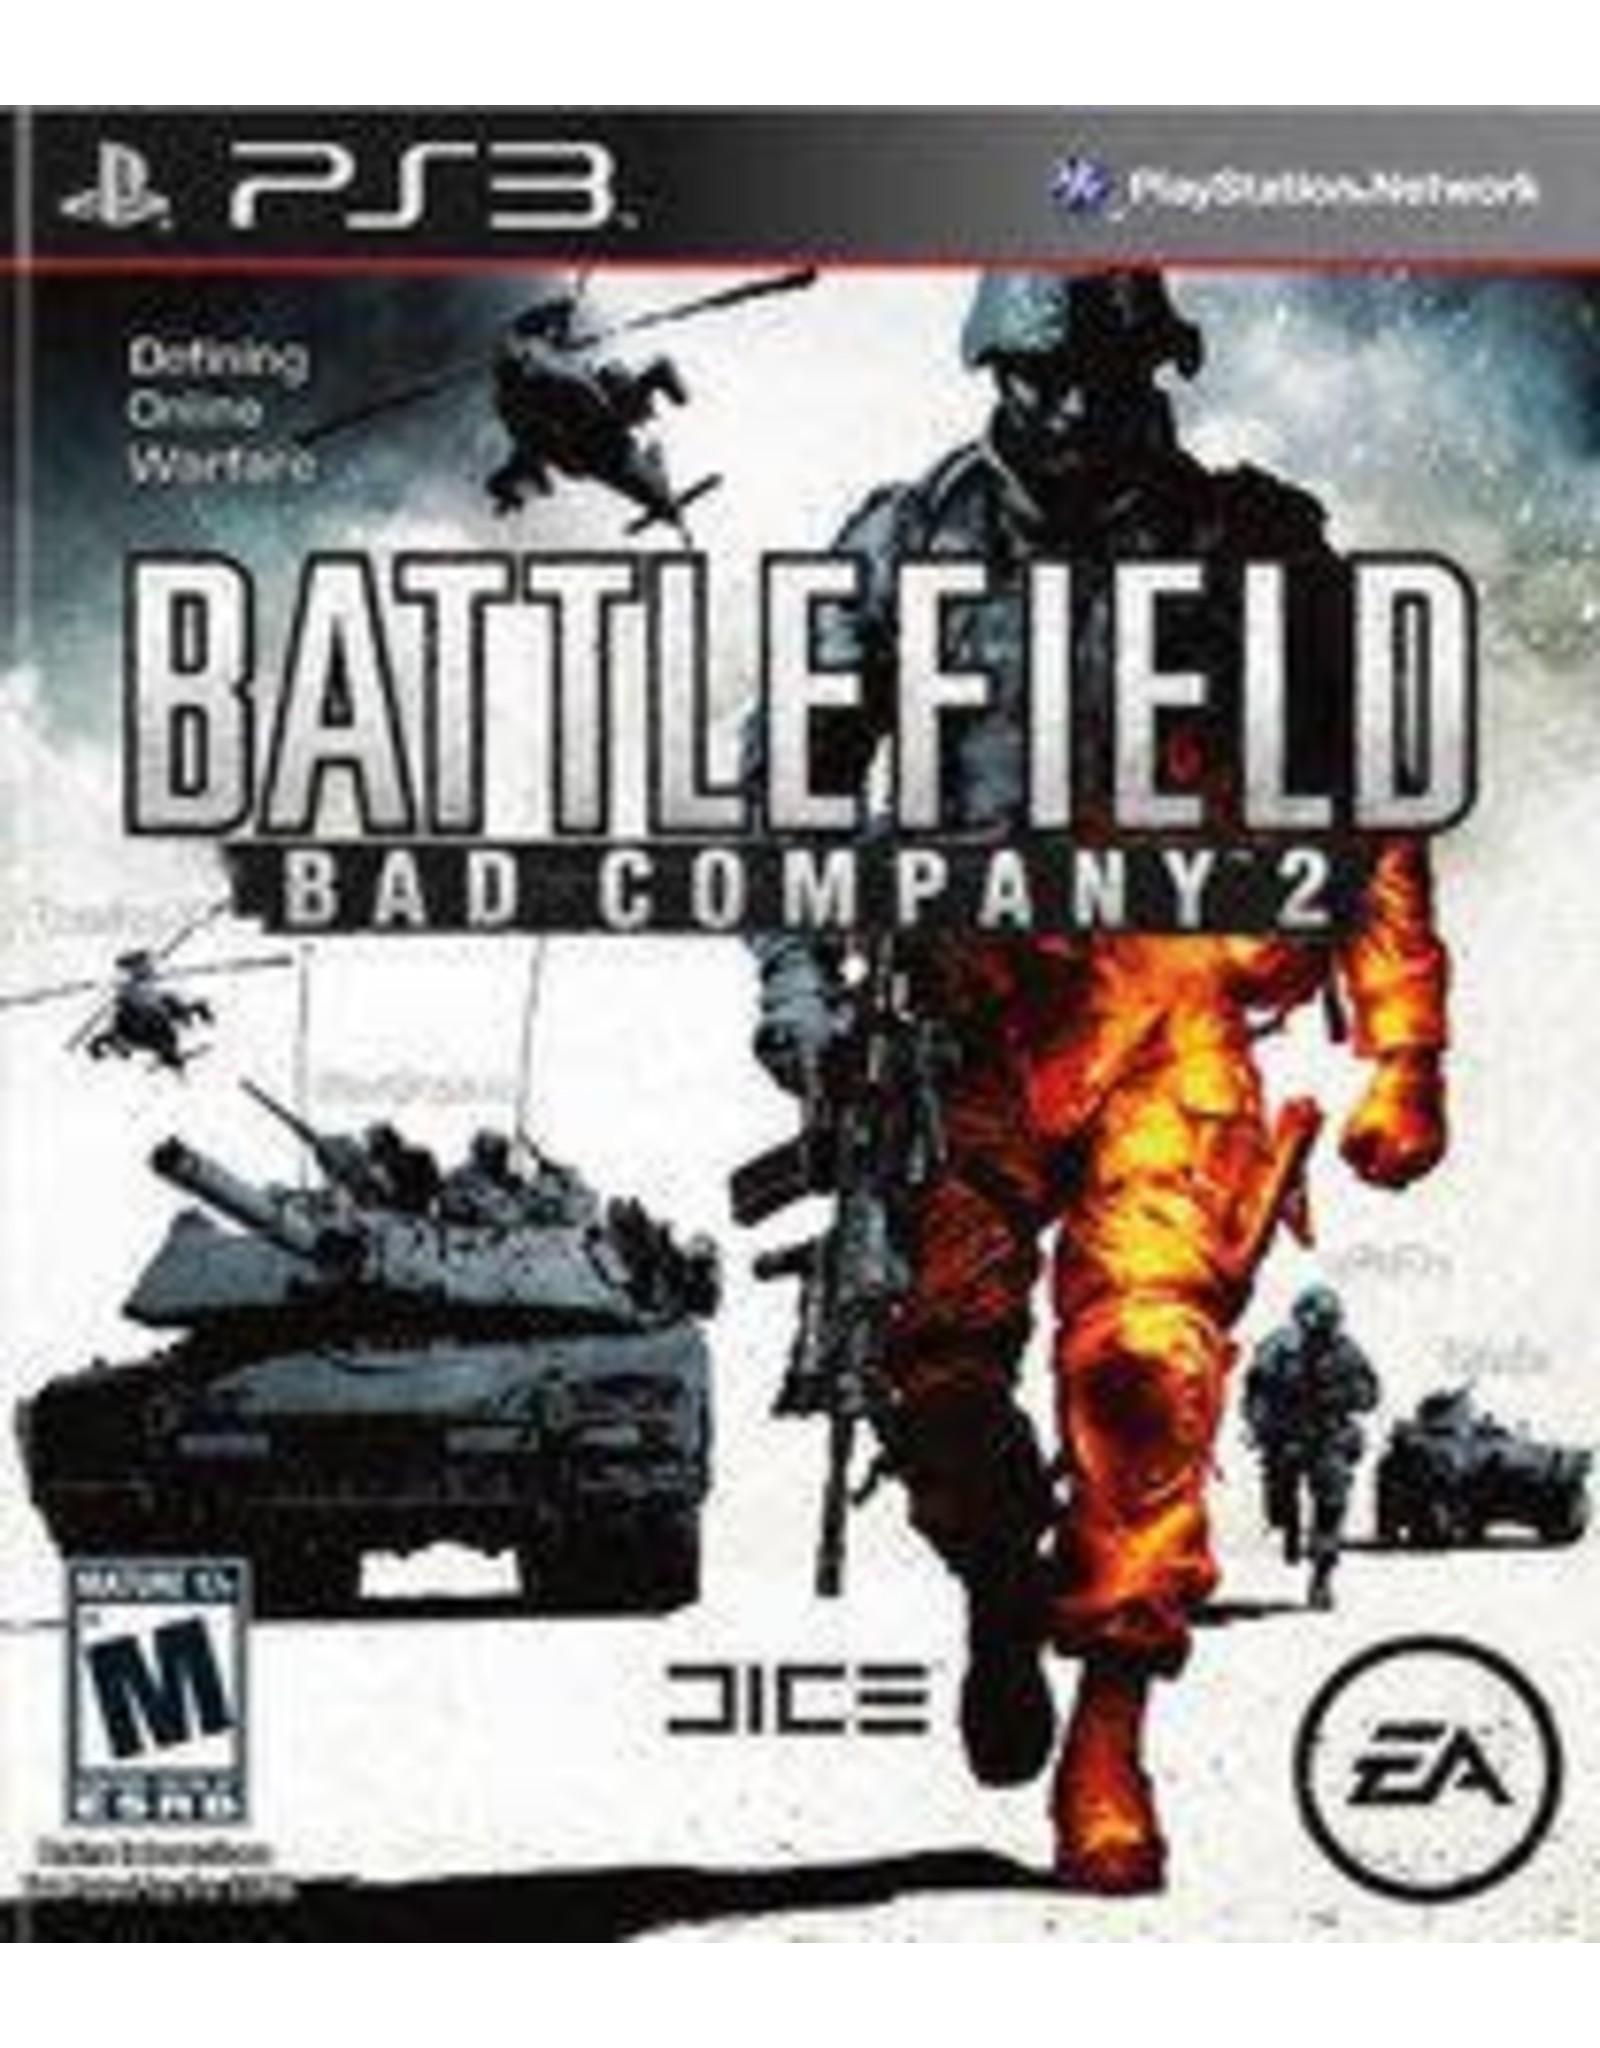 Playstation 3 Battlefield: Bad Company 2 (CiB)